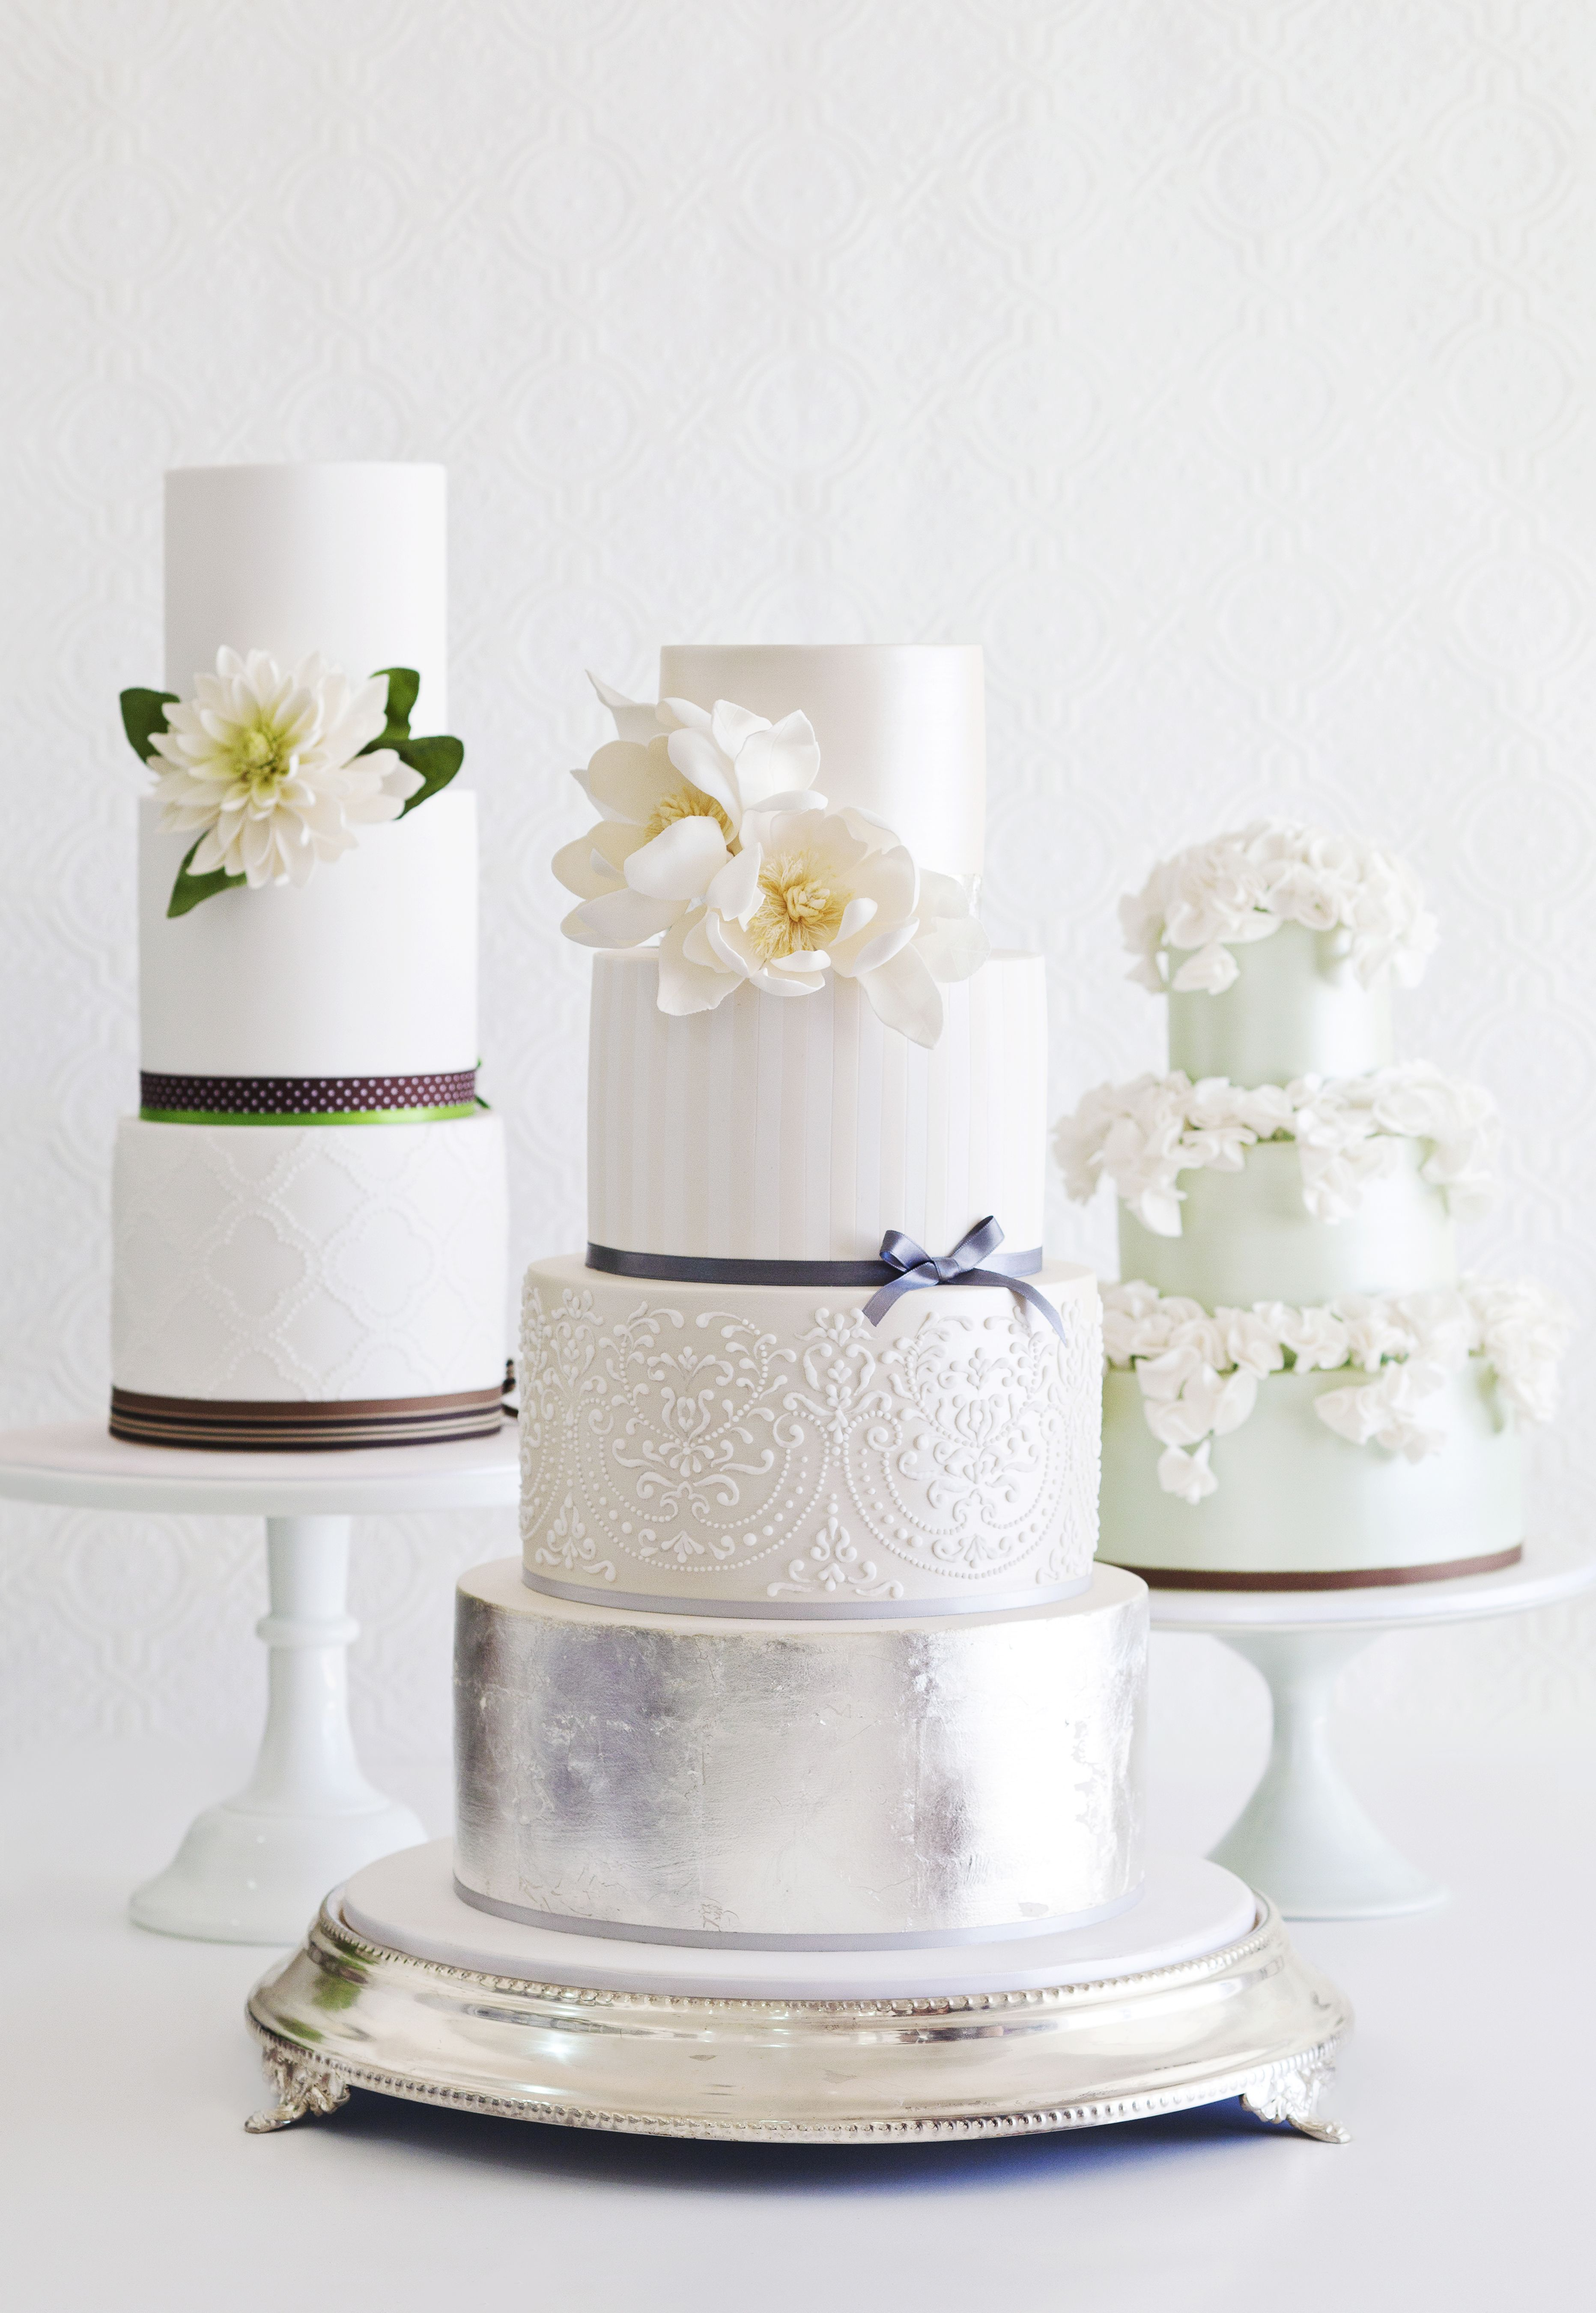 Faye Cahill Cake Design signature cakes | Yummy & Fancy | Pinterest ...